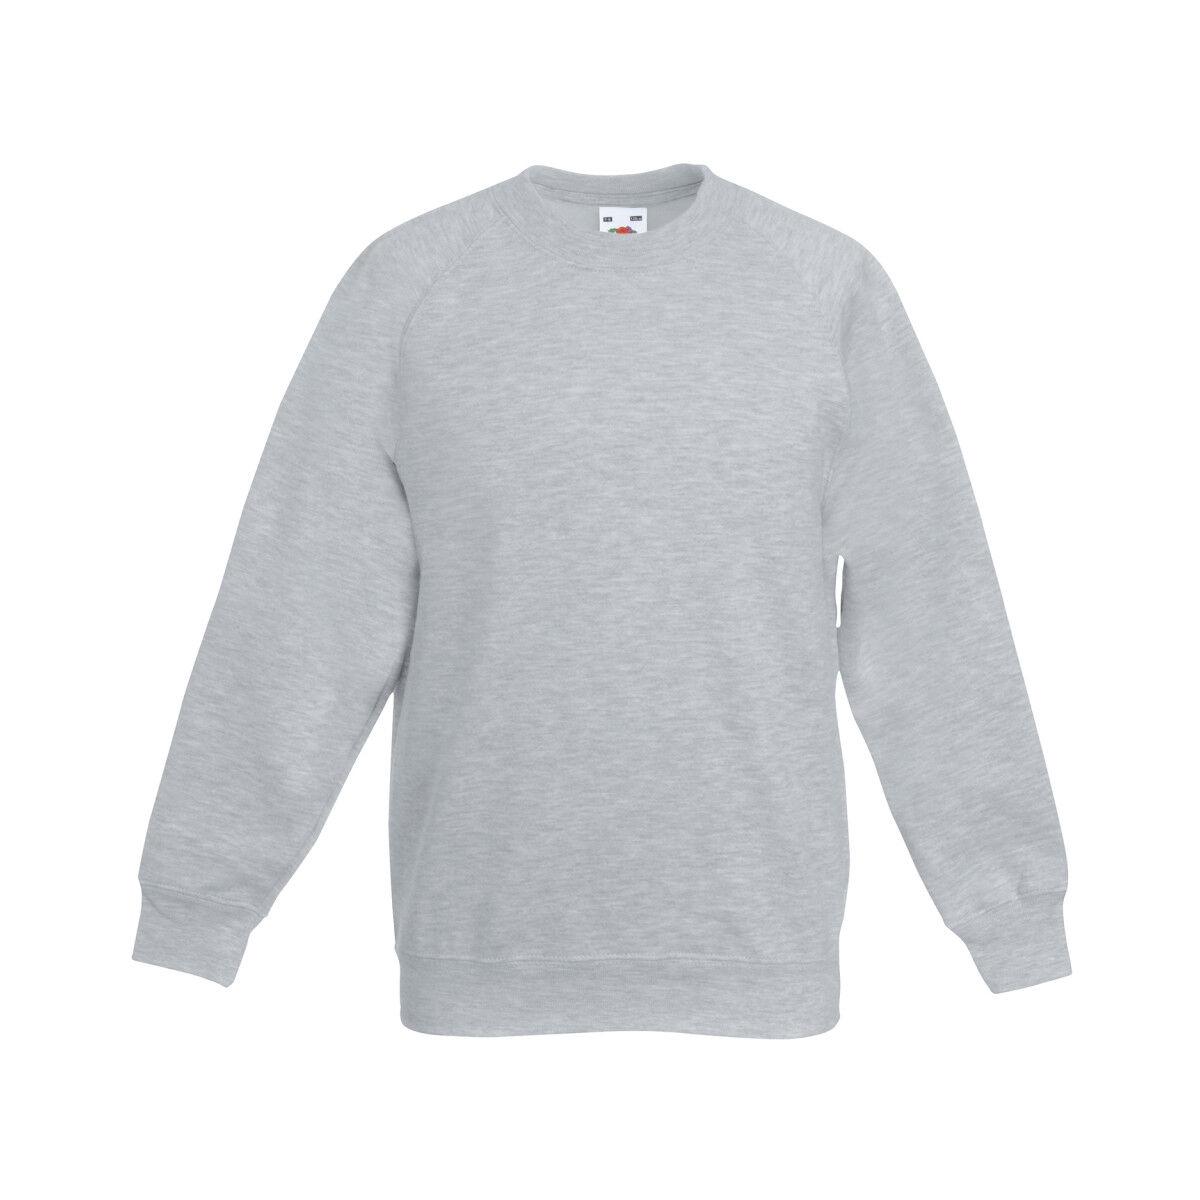 Fruit of the Loom Premium Sweatshirt